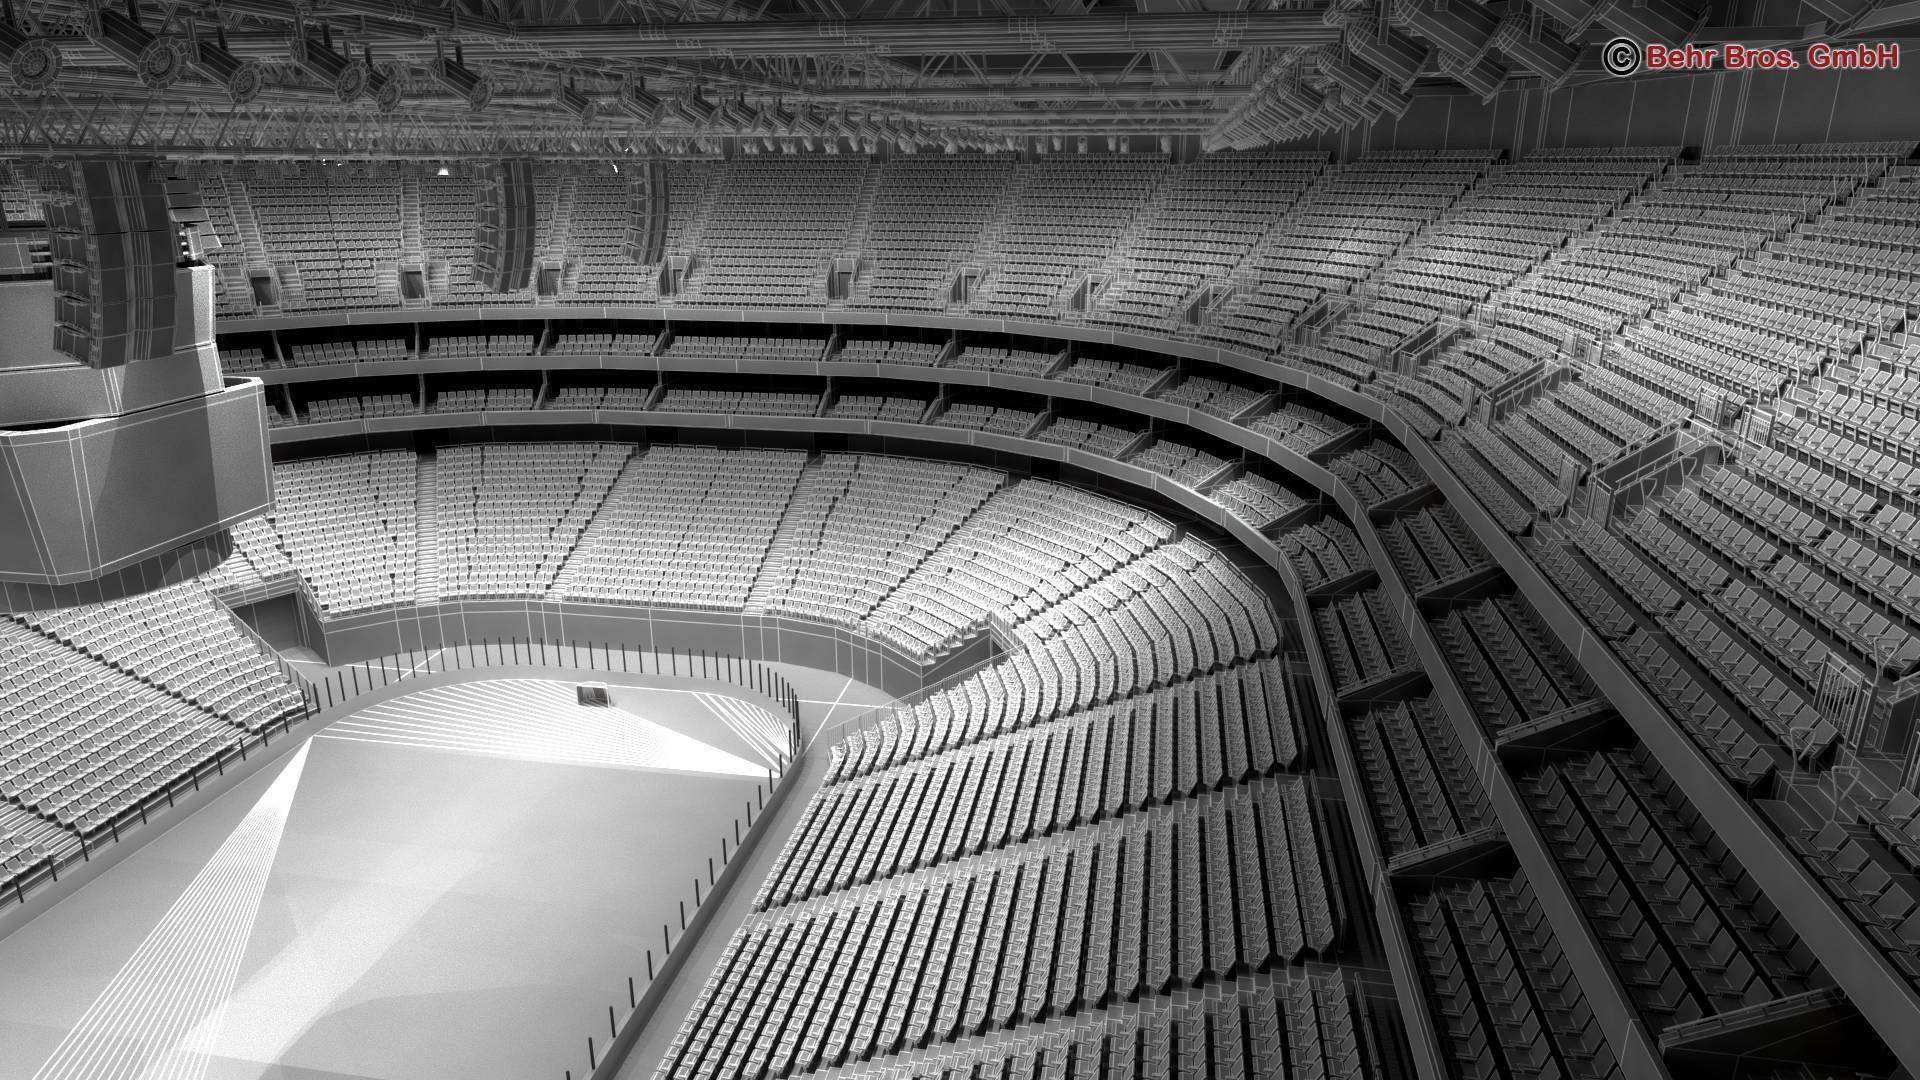 мөсөн хоккейн талбай V2 3d загвар 3ds max fbx c4d 251665